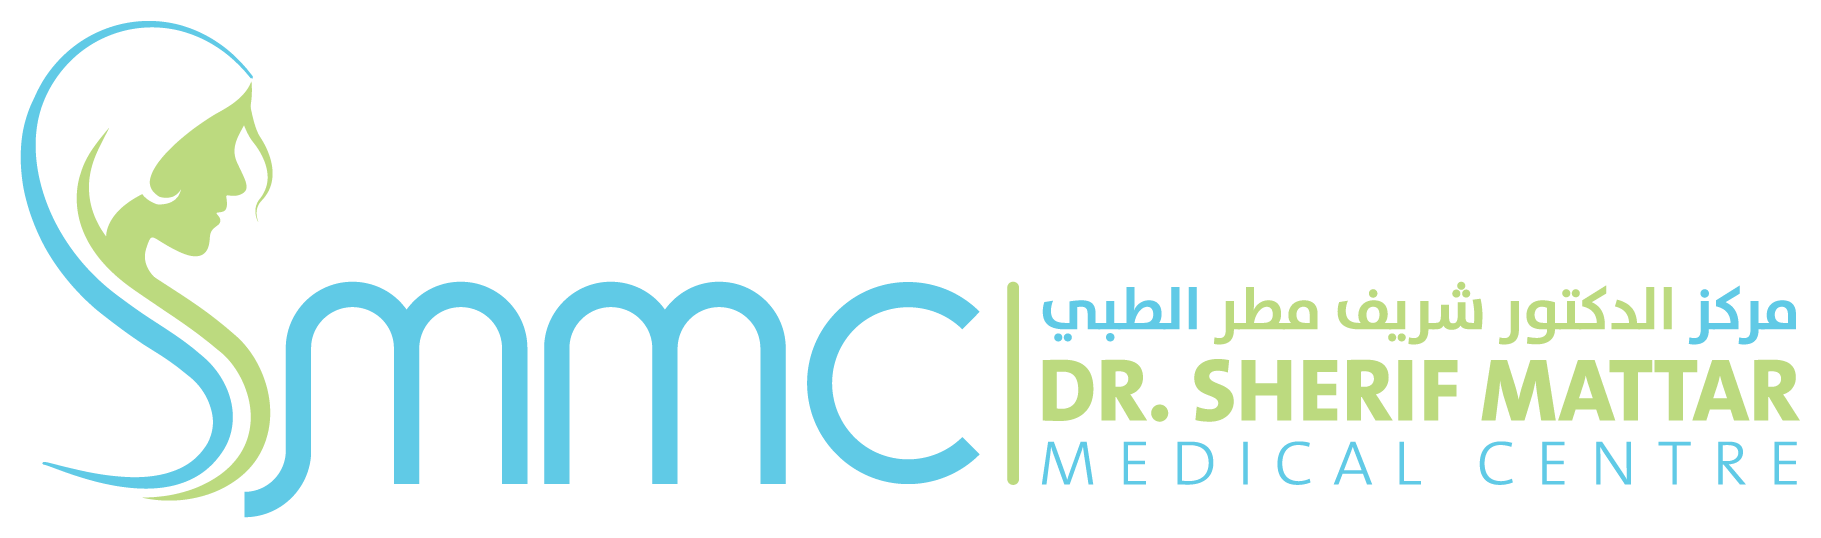 LightSheer Laser Hair Removal - Dr. Sherif Mattar Medical Center in Abu Dhabi